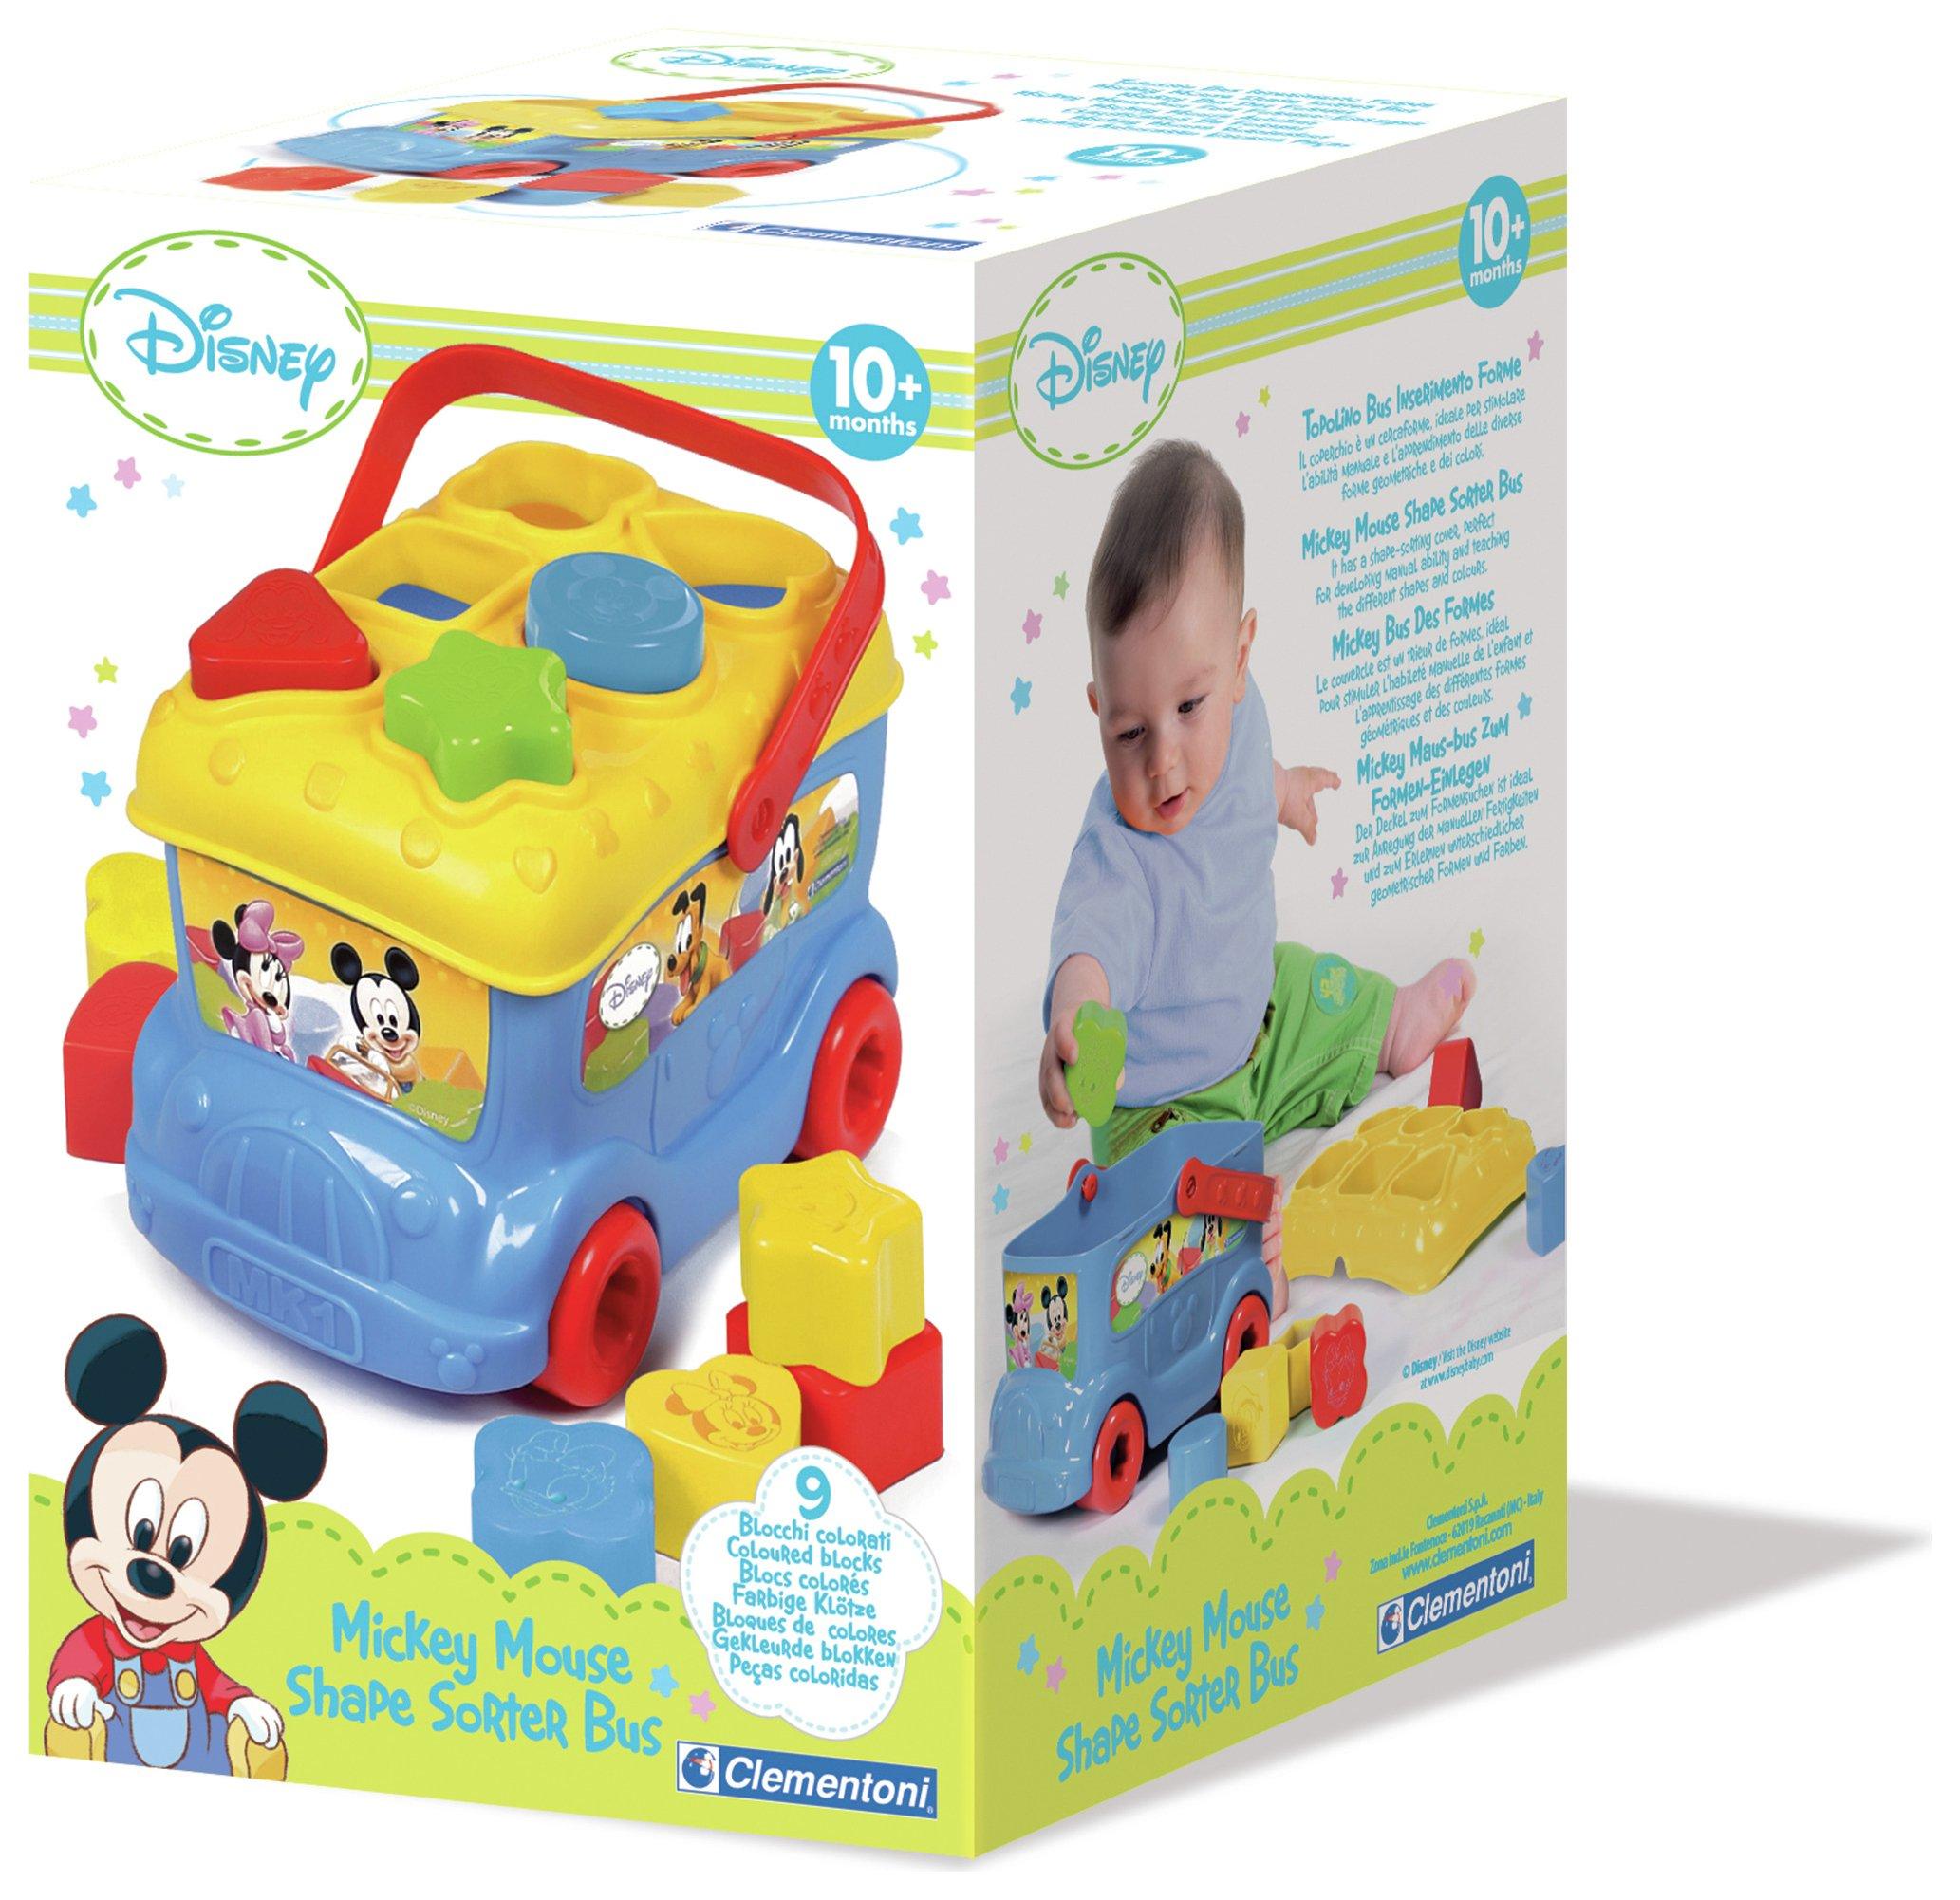 Image of Disney Baby Shape Sorter Bus.